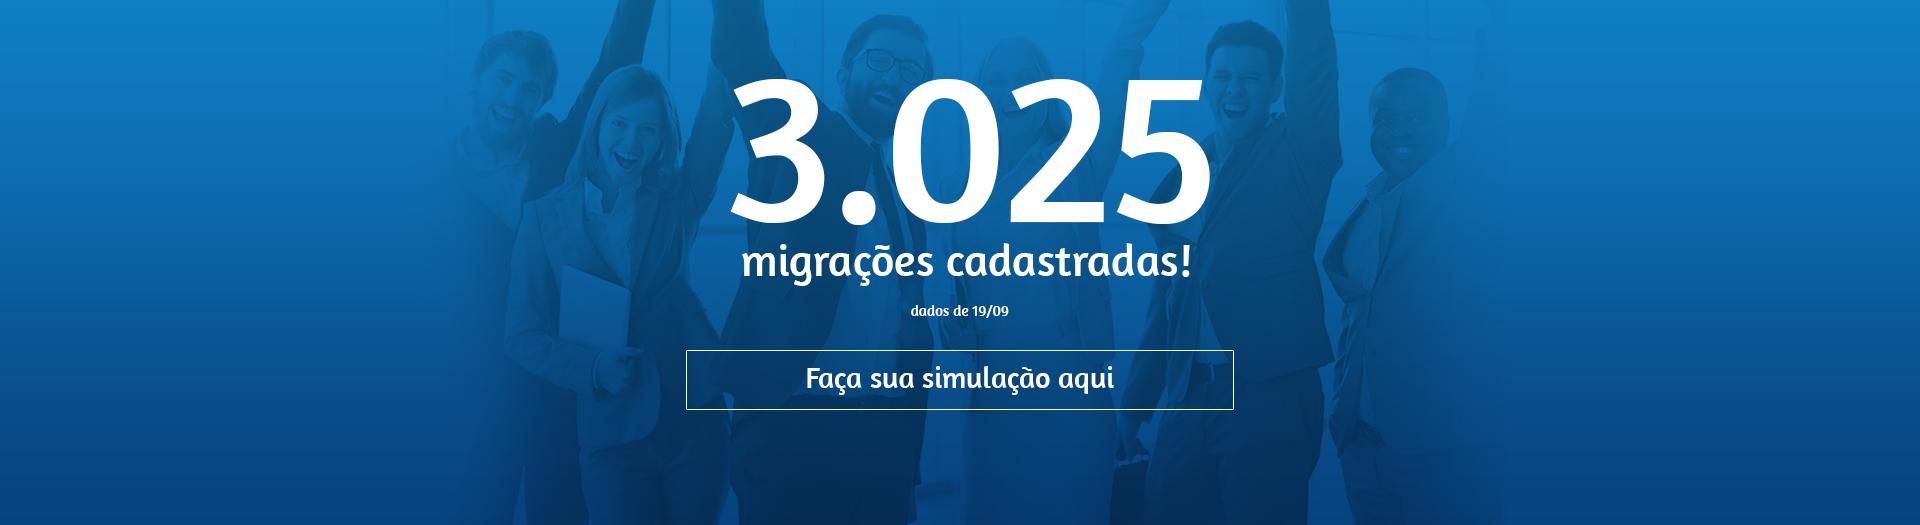 Funpresp_Site_Banner_migracao_sem-texto_patrocinador-4